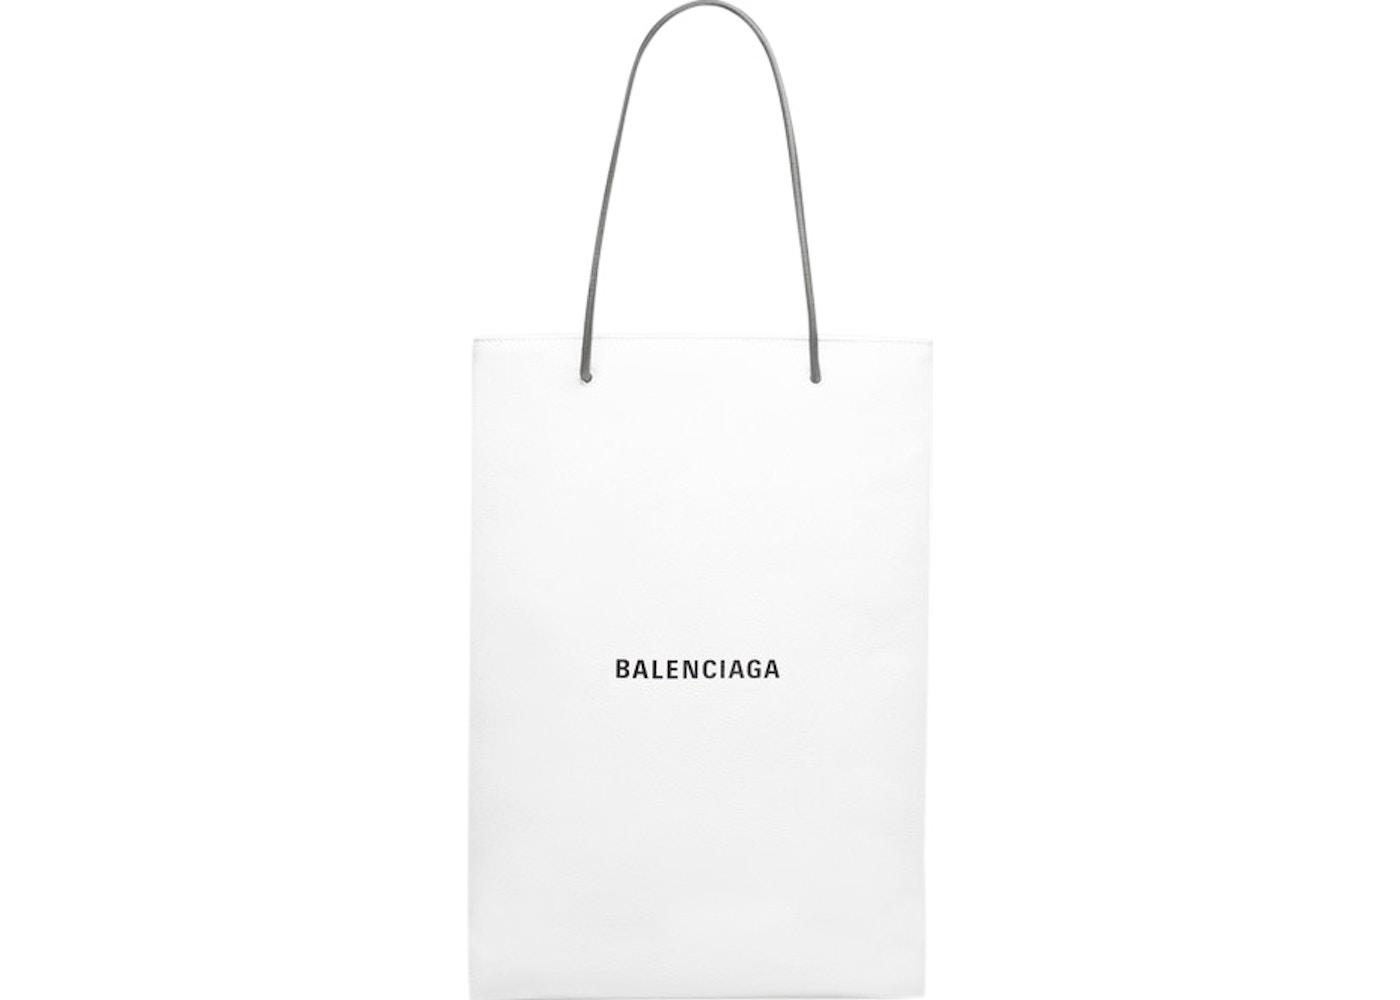 fc378a7707 Balenciaga North-South Shopping Bag Long Medium White Black. Long Medium  White Black